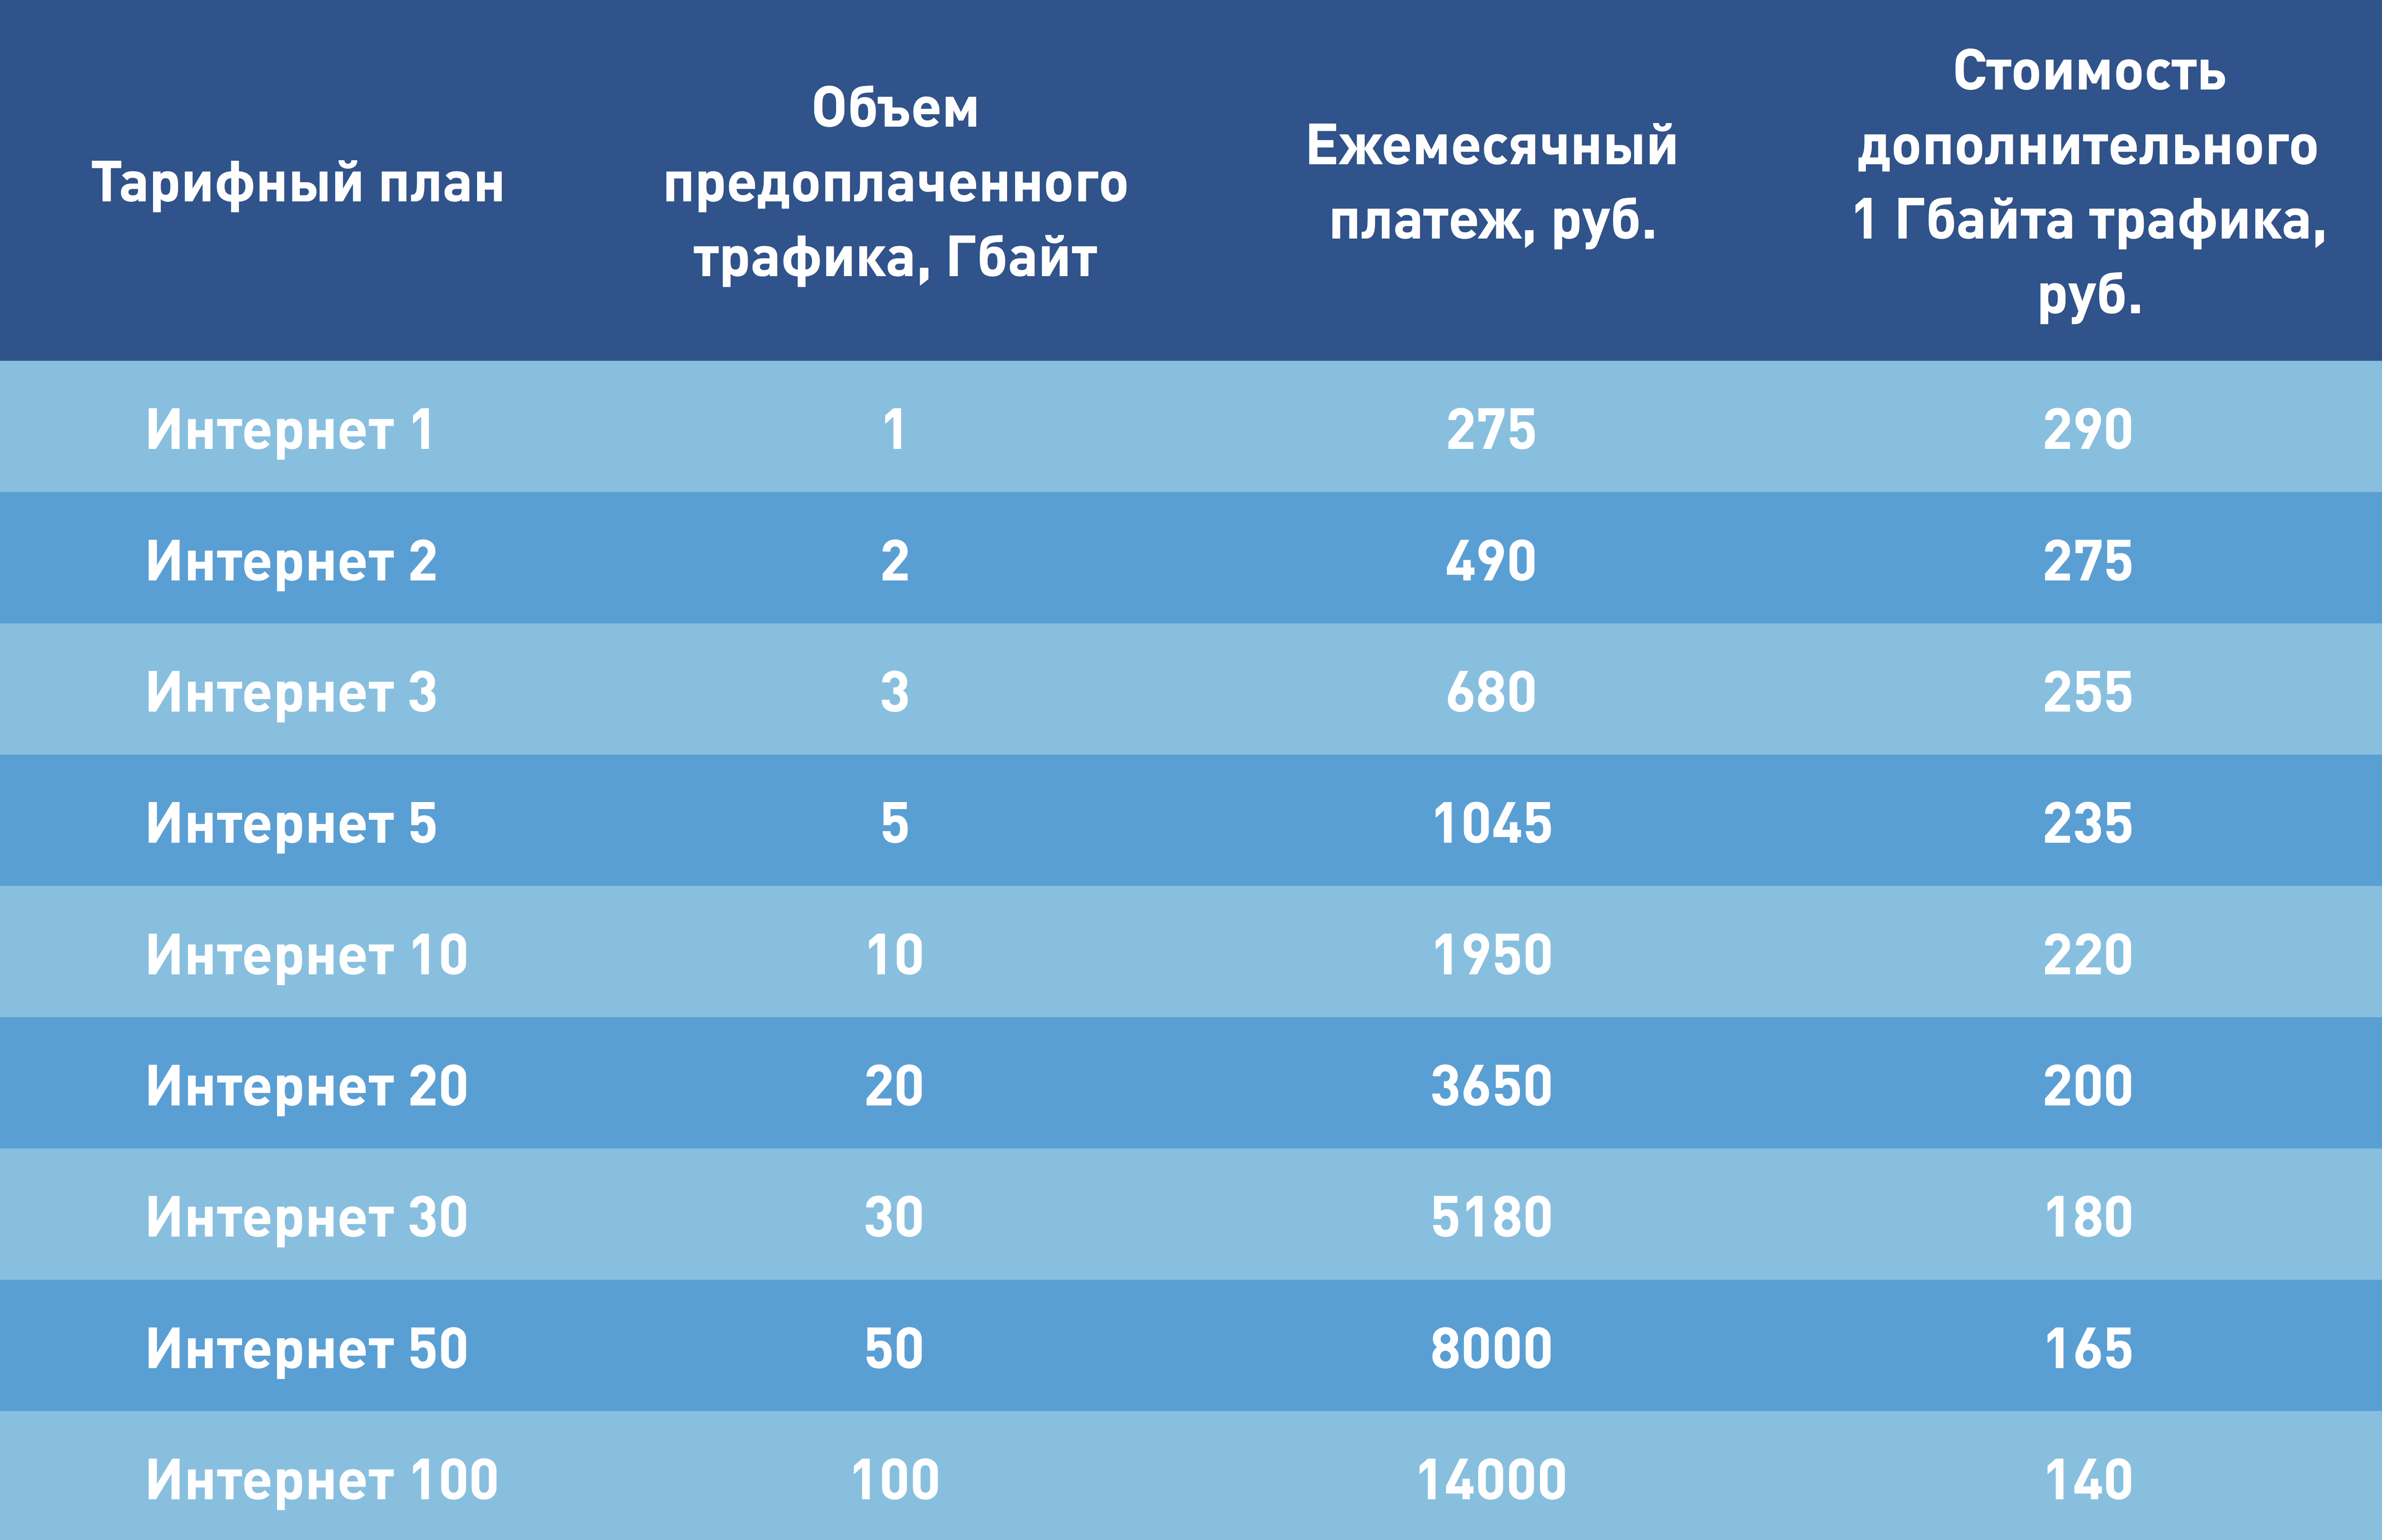 http://s.lpmtr.ru/files/b/9/e/b9ea9af0a2345387ea8474c8b6004d0b.png